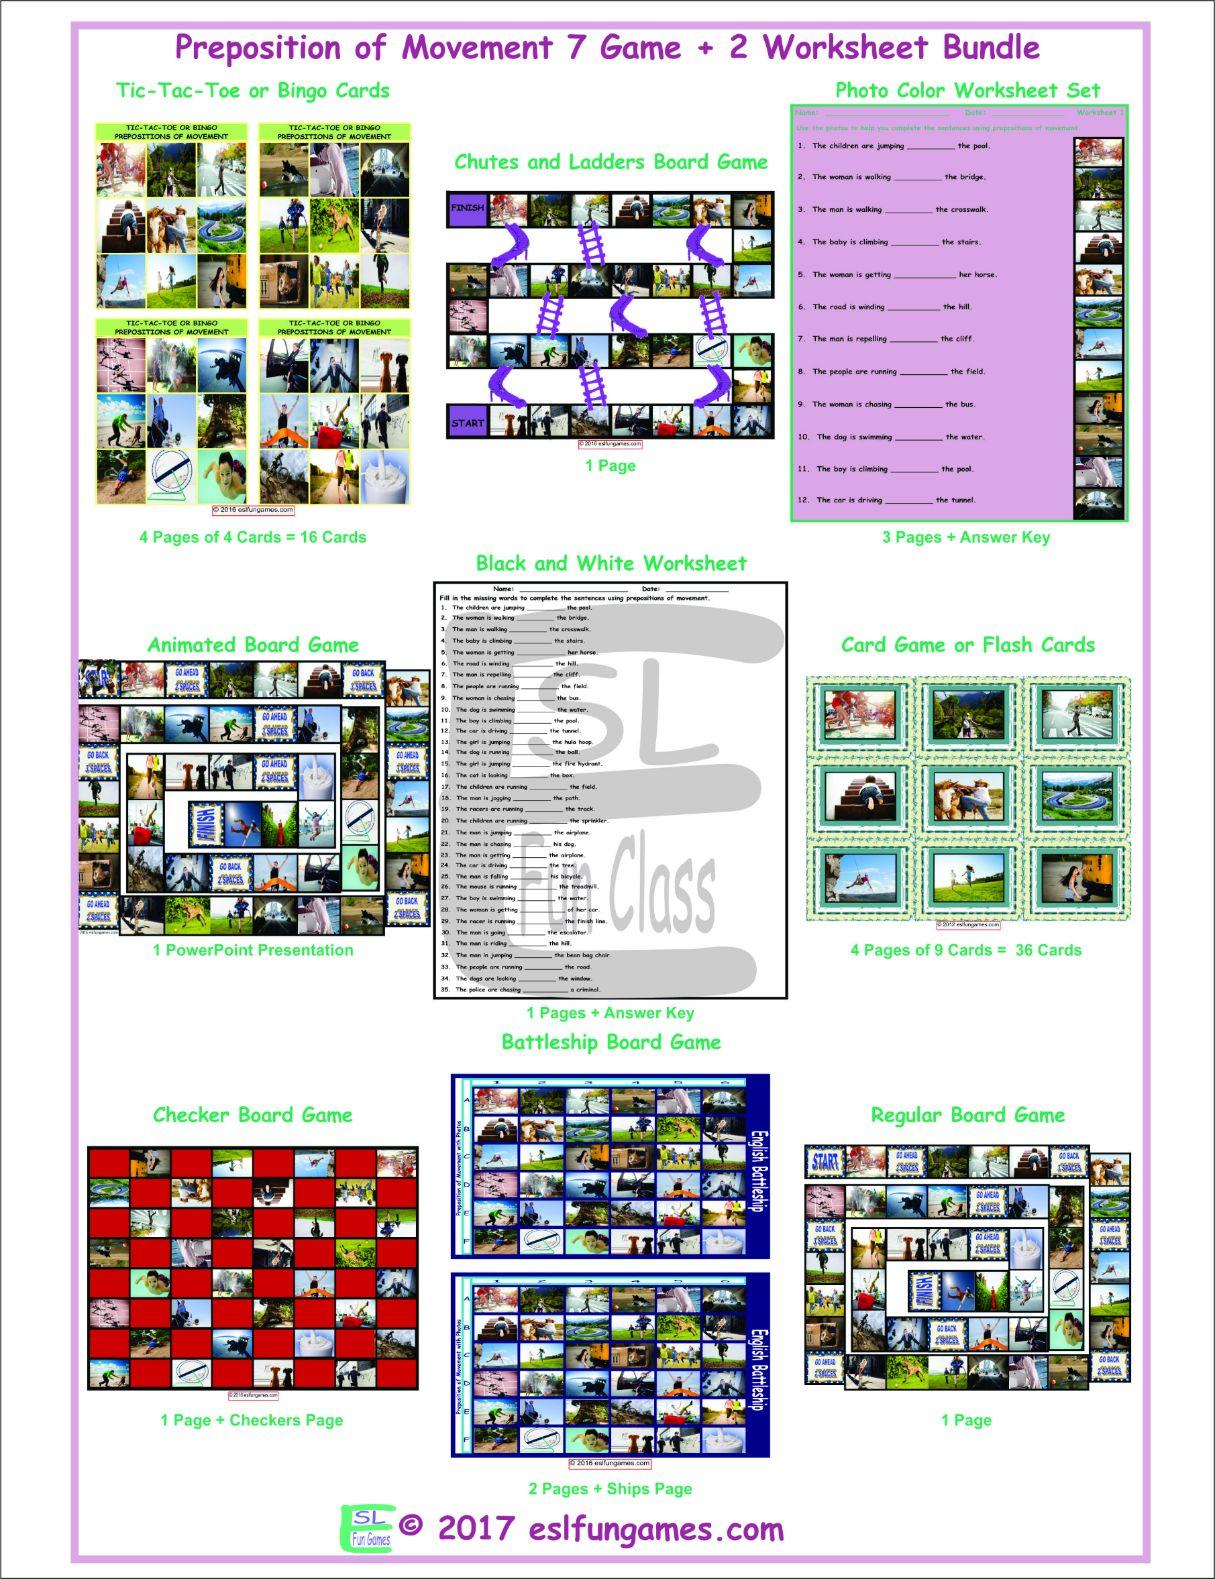 Prepositions Of Movement 7 Game Plus 2 Worksheet Bundle